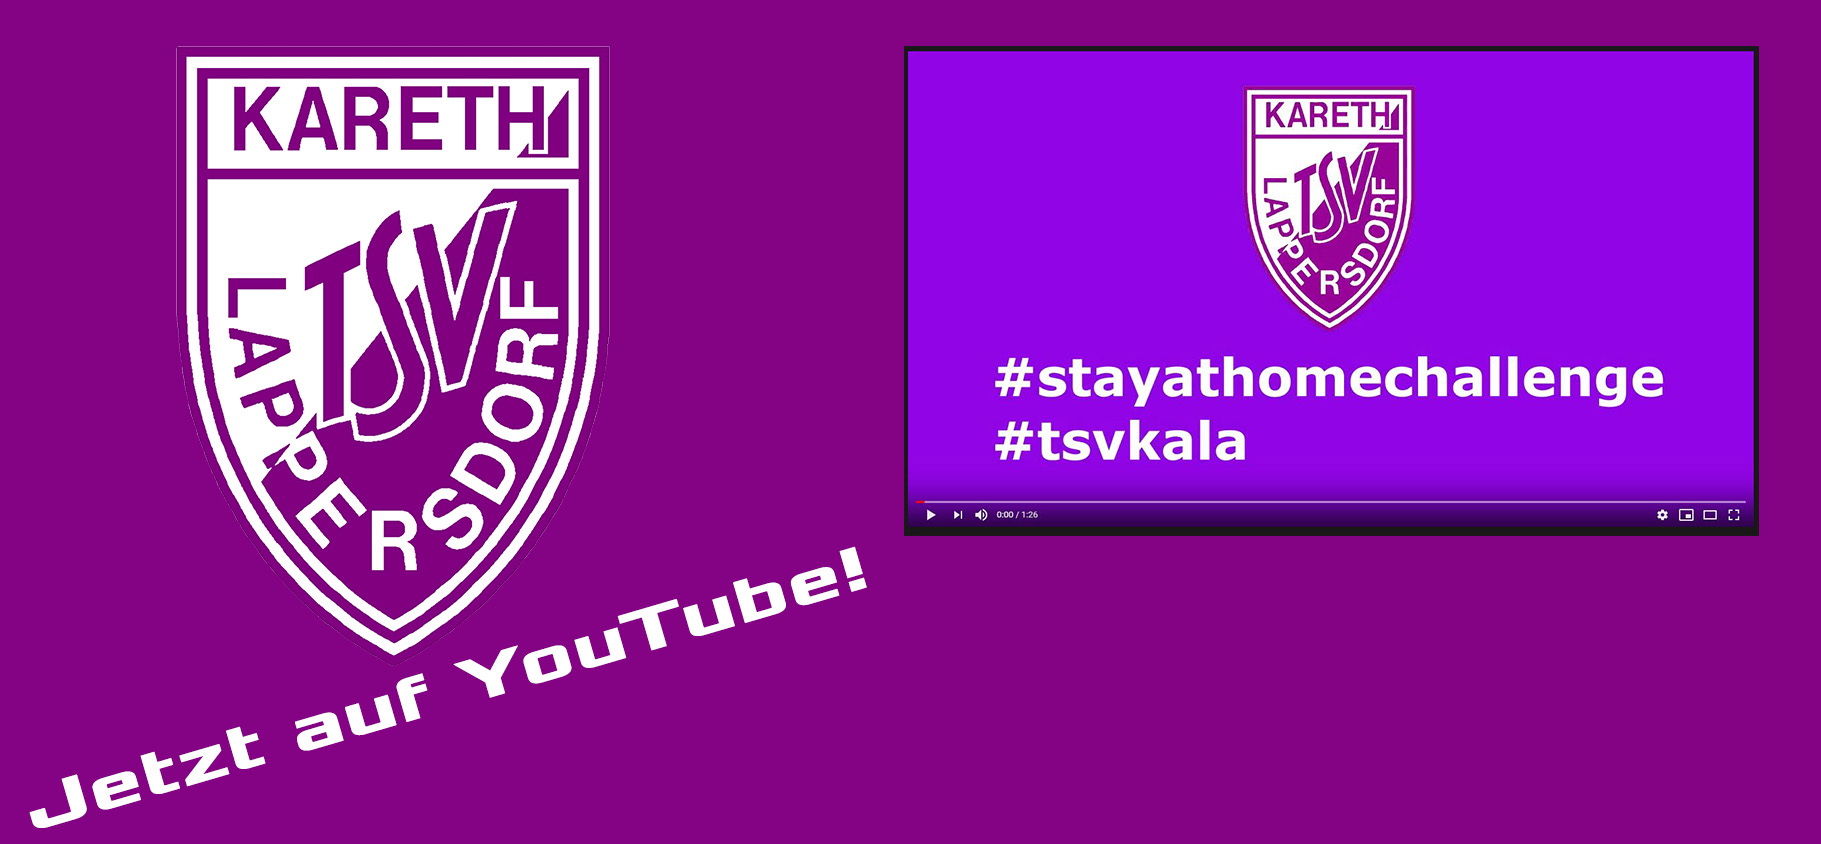 #stayathomechallenge des TSV Kareth-Lappersdorf